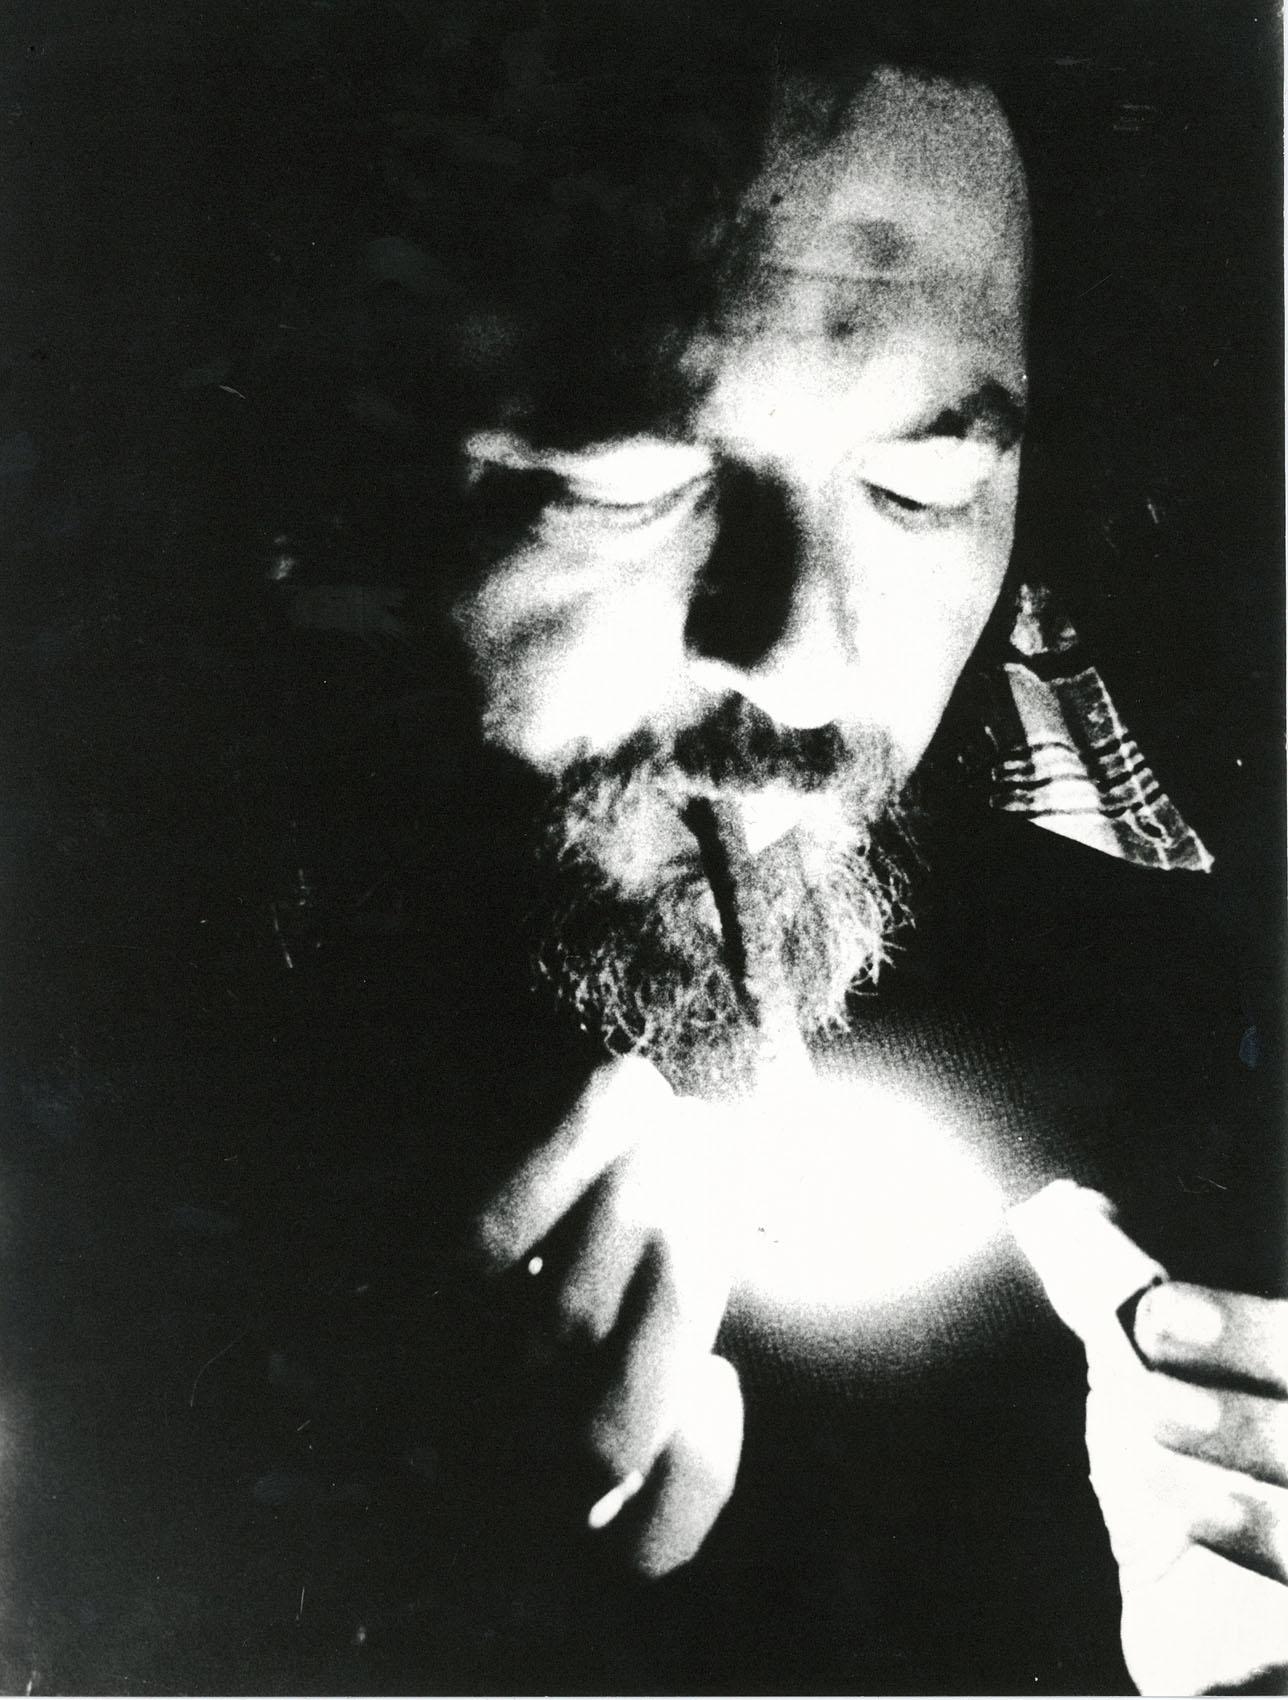 Sam Rykiel (Photo Rykiel, 1973-DR)